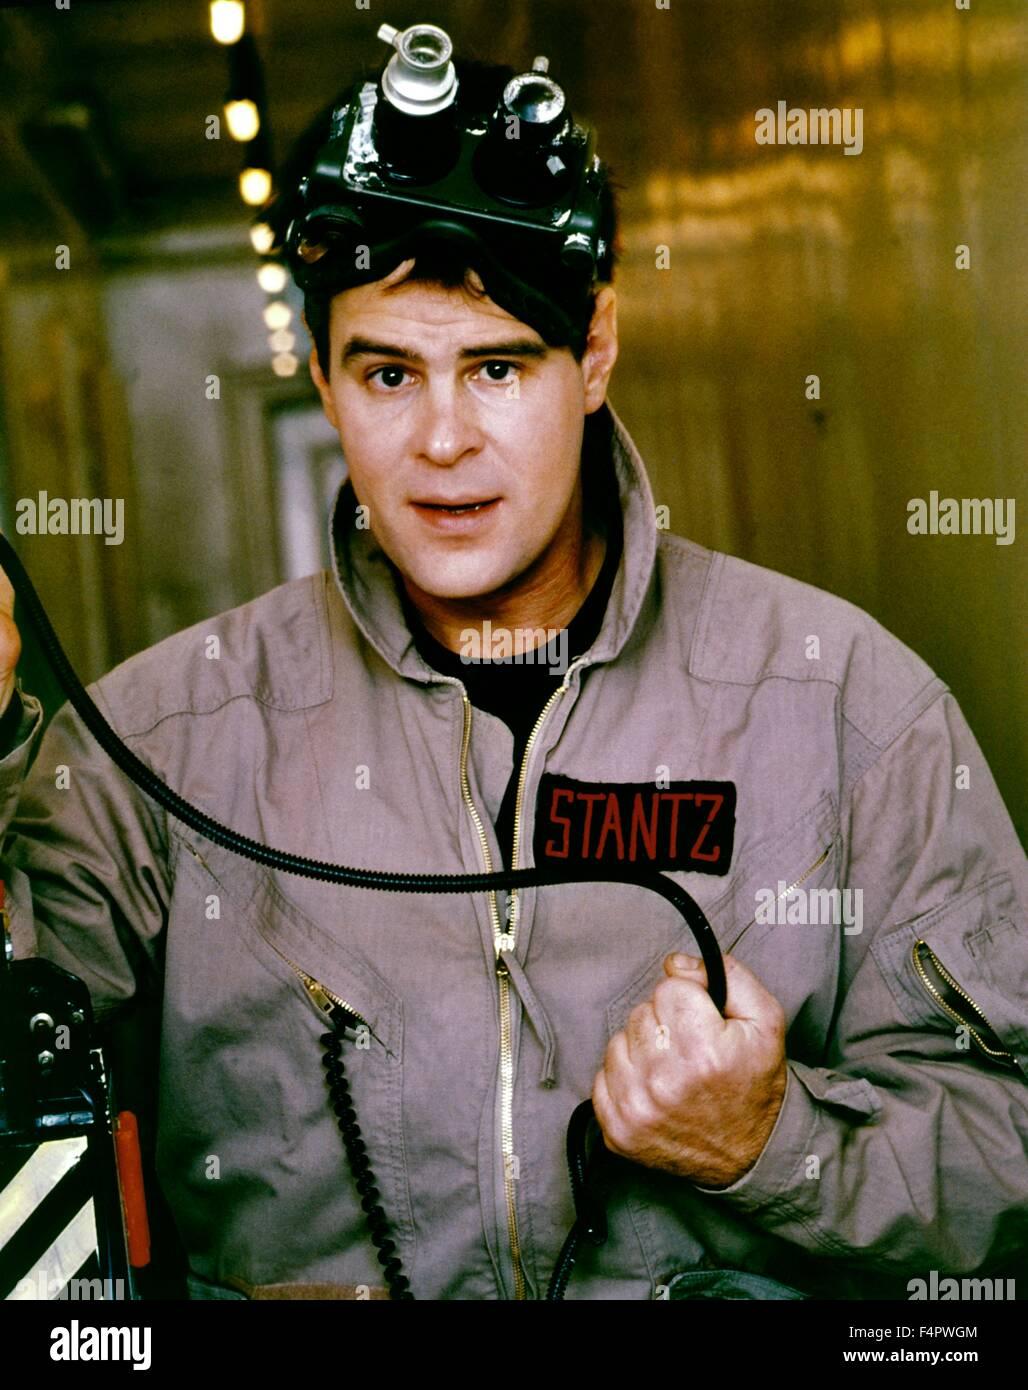 Dan Aykroyd / Ghostbusters / 1984 directed by Ivan Reitman [Columbia Pictures] - Stock Image